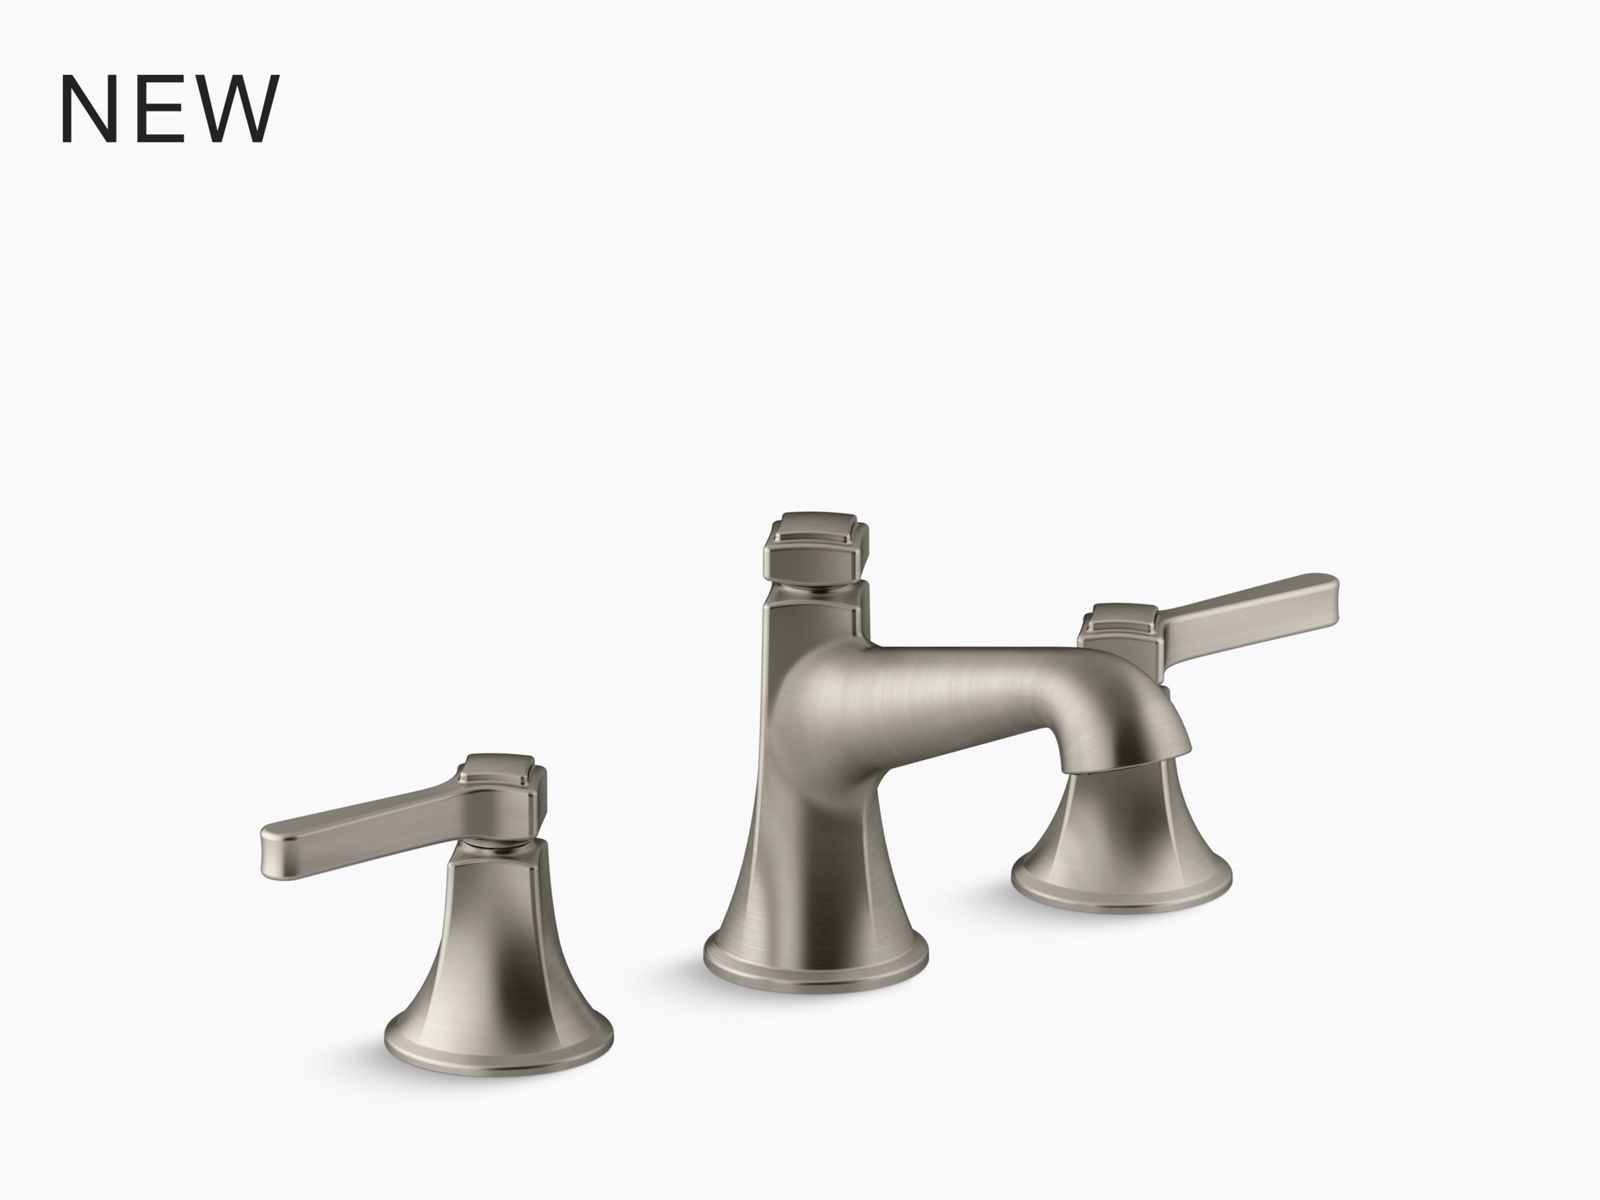 components bathroom sink handles with industrial design